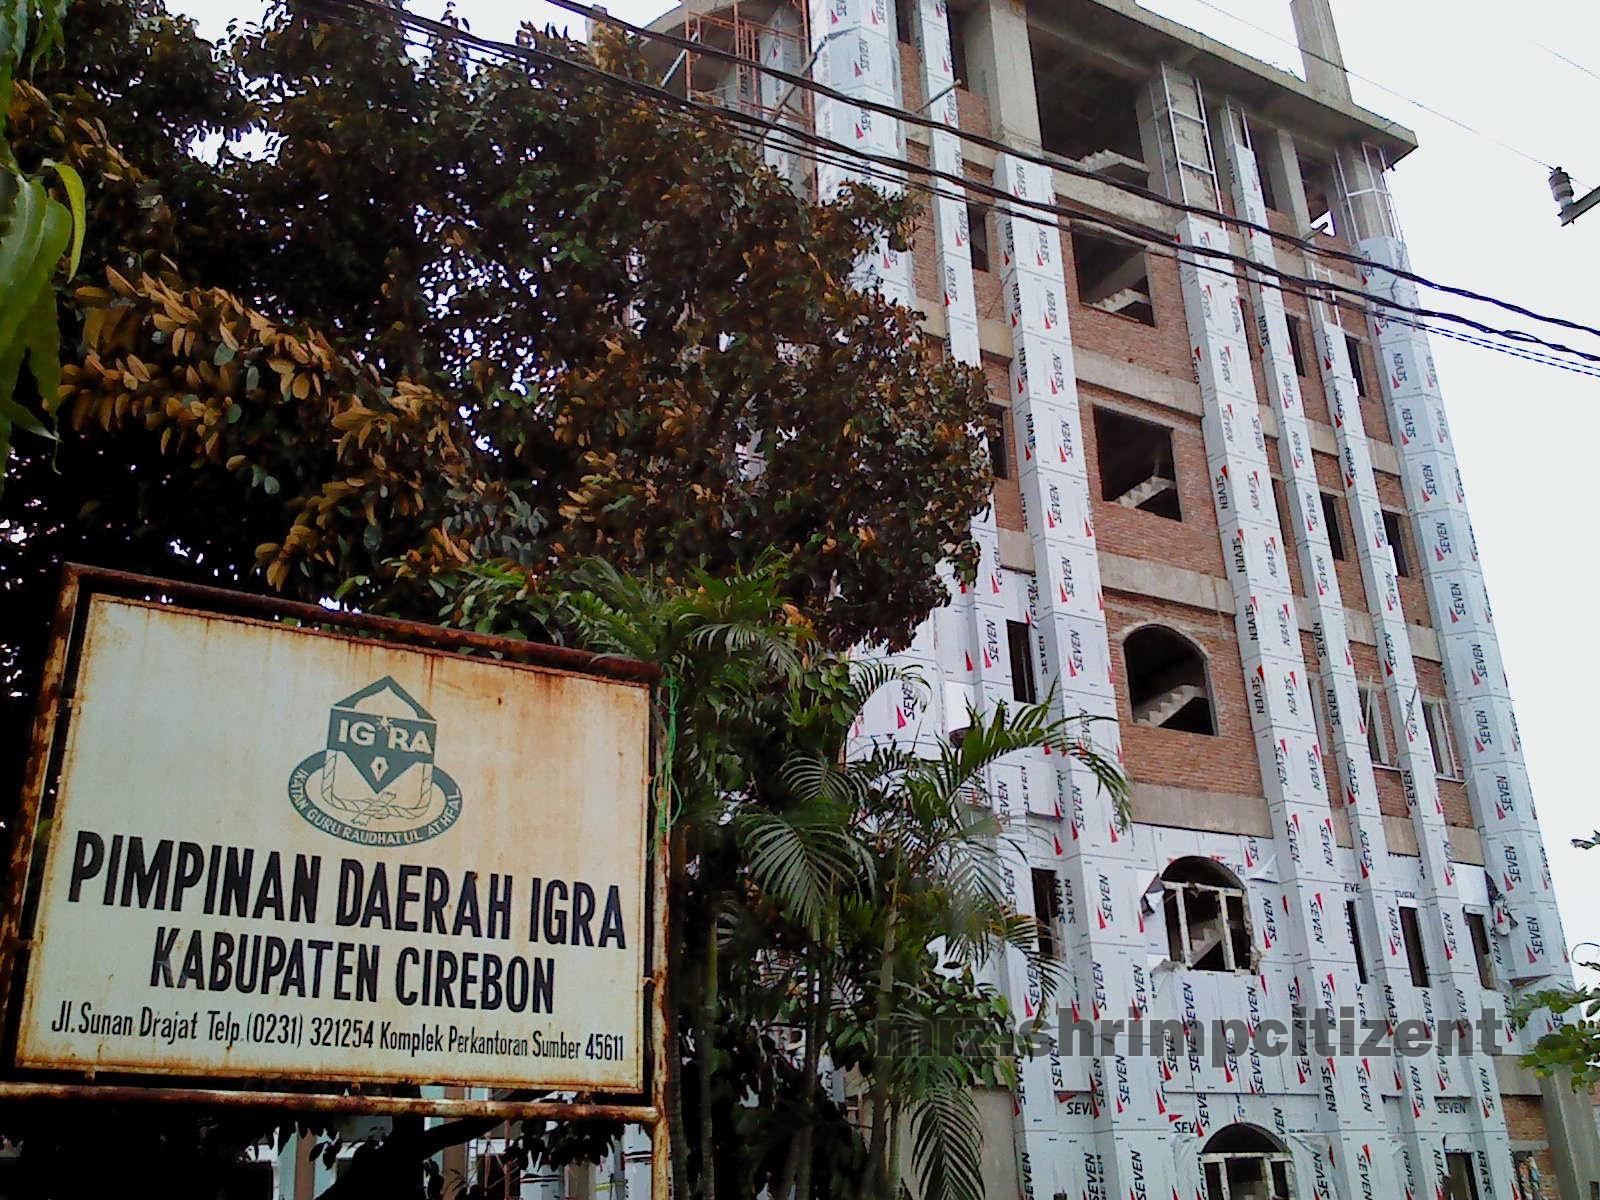 Pembangunan Menara Masjid Agung Sumber, Kab. Cirebon 8